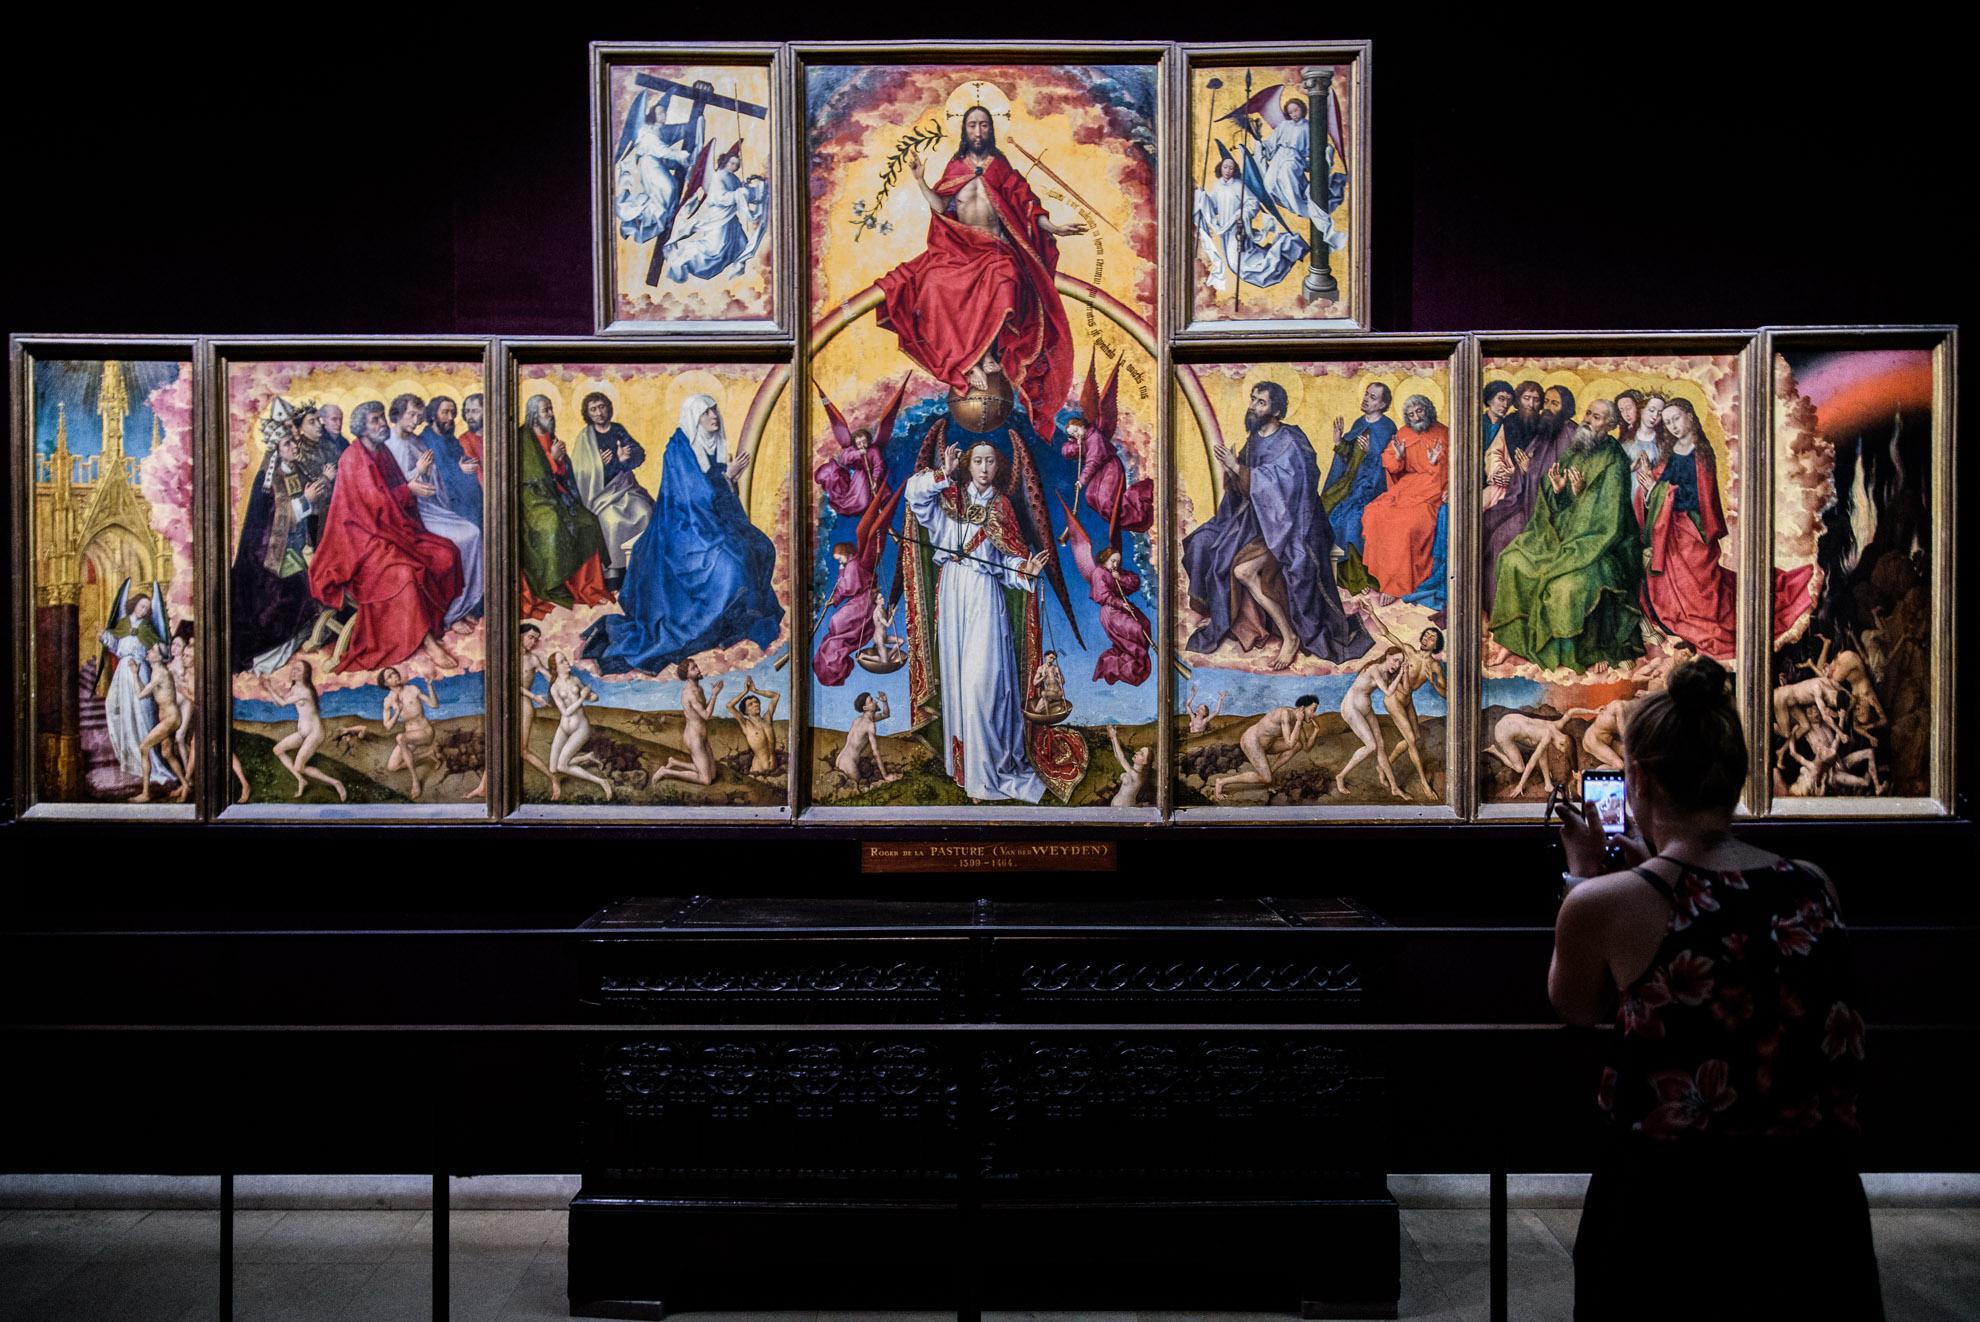 """Sąd ostateczny"" autorstwaRogiera van der Weydena"